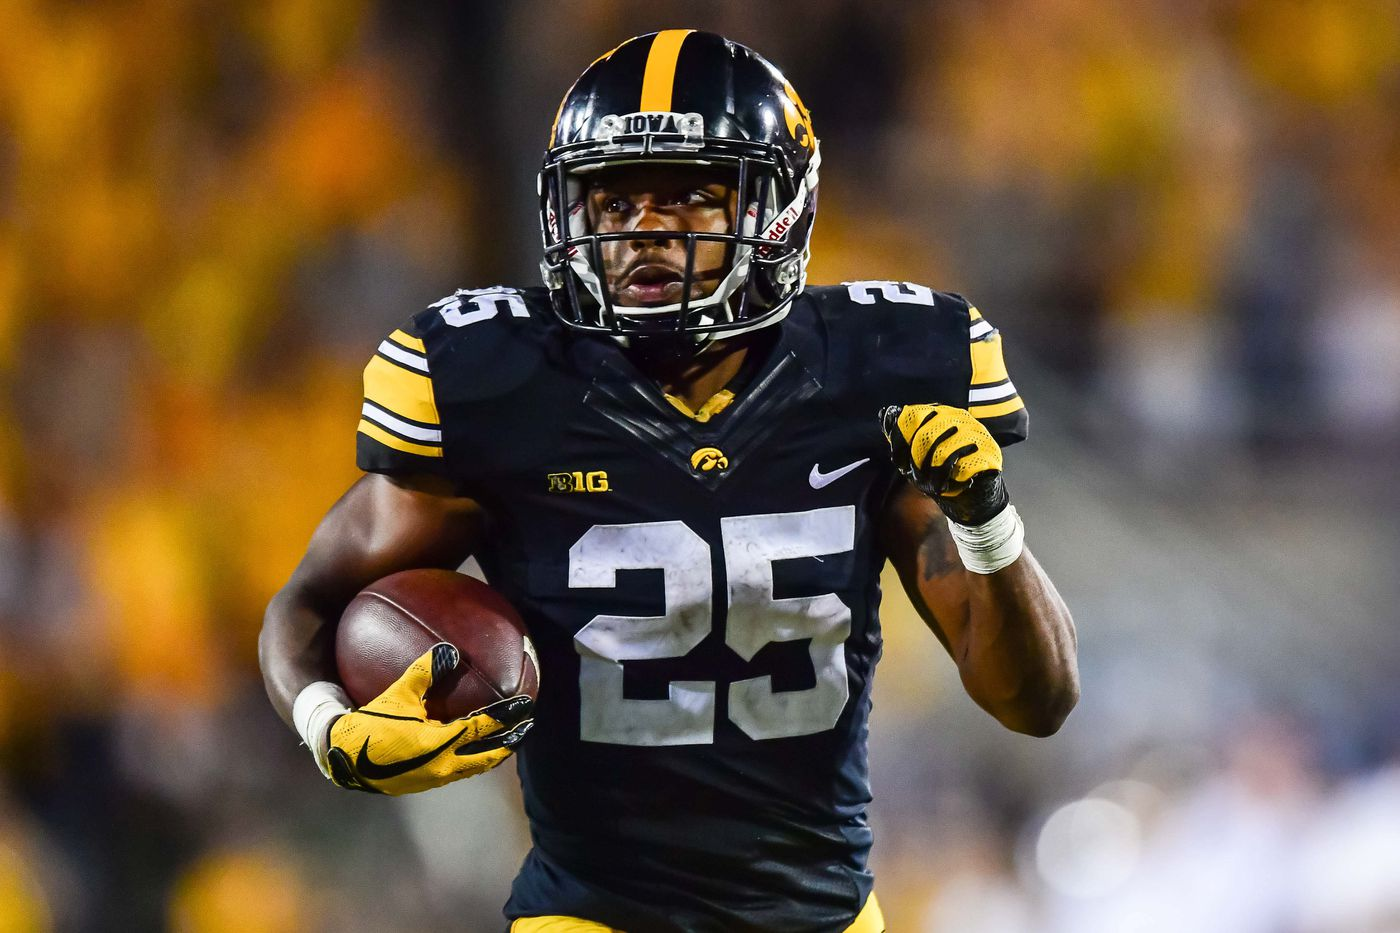 sale retailer 9ed52 8c4d3 Steelers throwback uniform looks just like Iowa's: Photo of ...